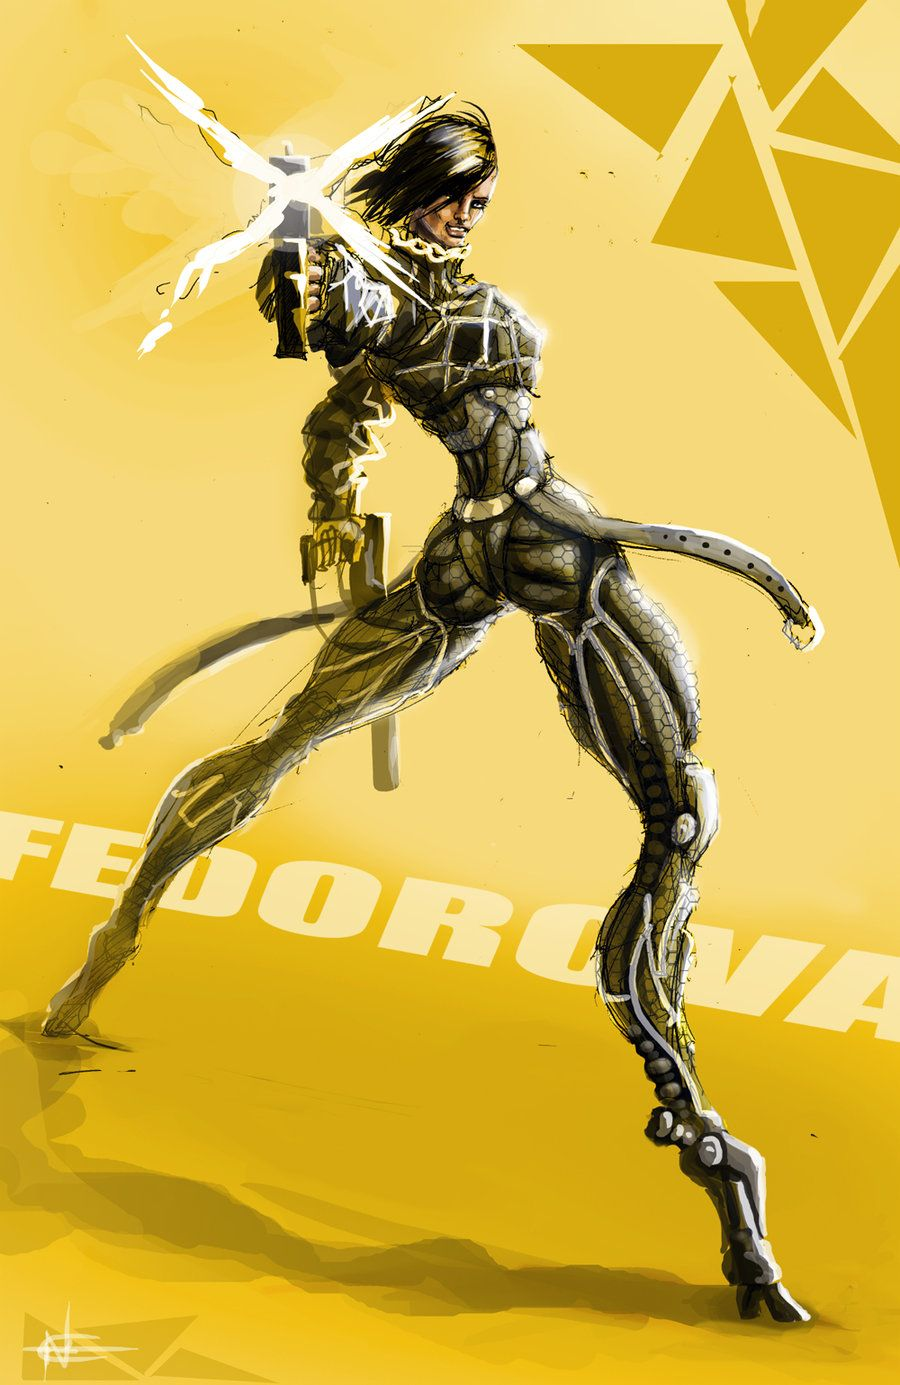 Deus Ex HR: Fedorova by AspectusFuturus.deviantart.com on @deviantART